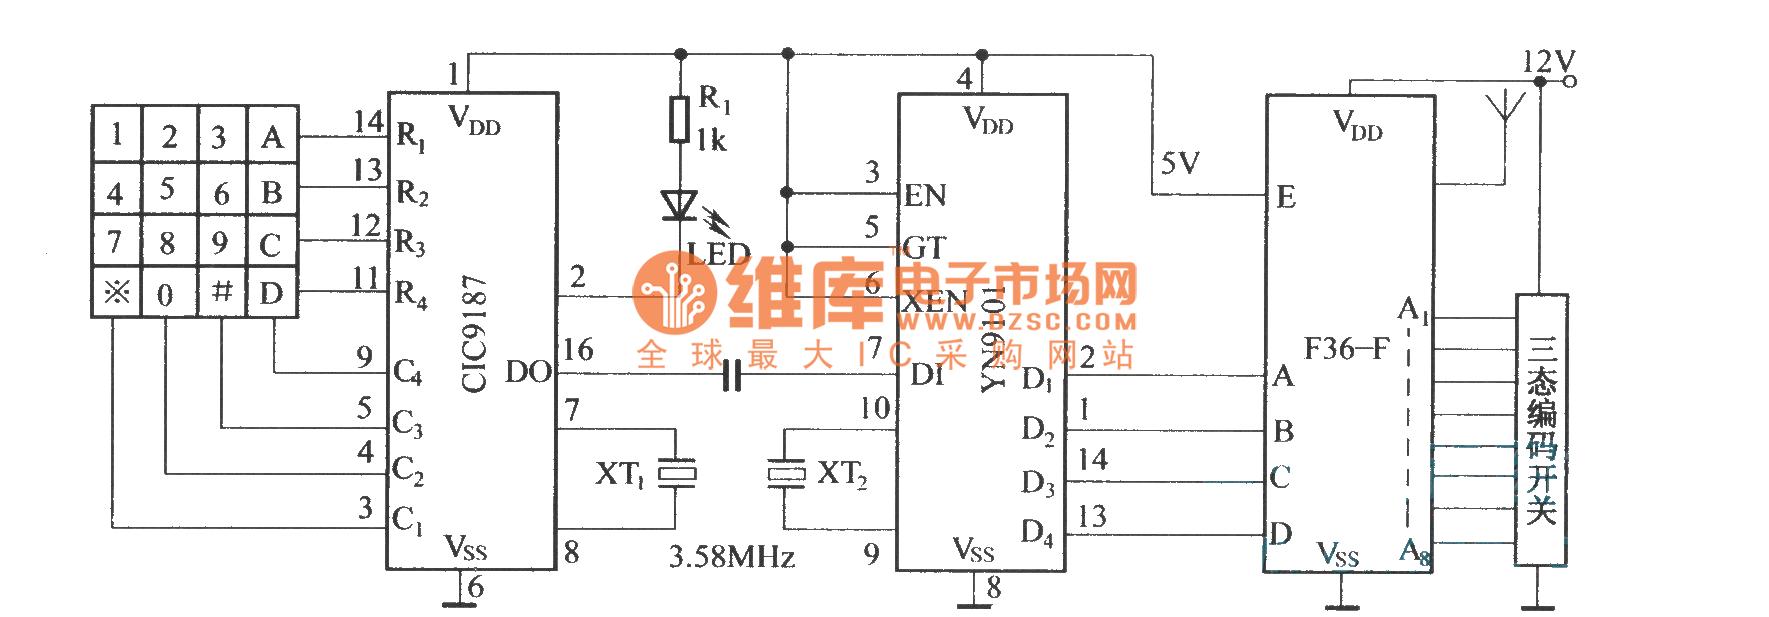 Digital Paging Systemf36 F F36 J Circuit Diagram Other Calibratedtachometer Basiccircuit Seekiccom